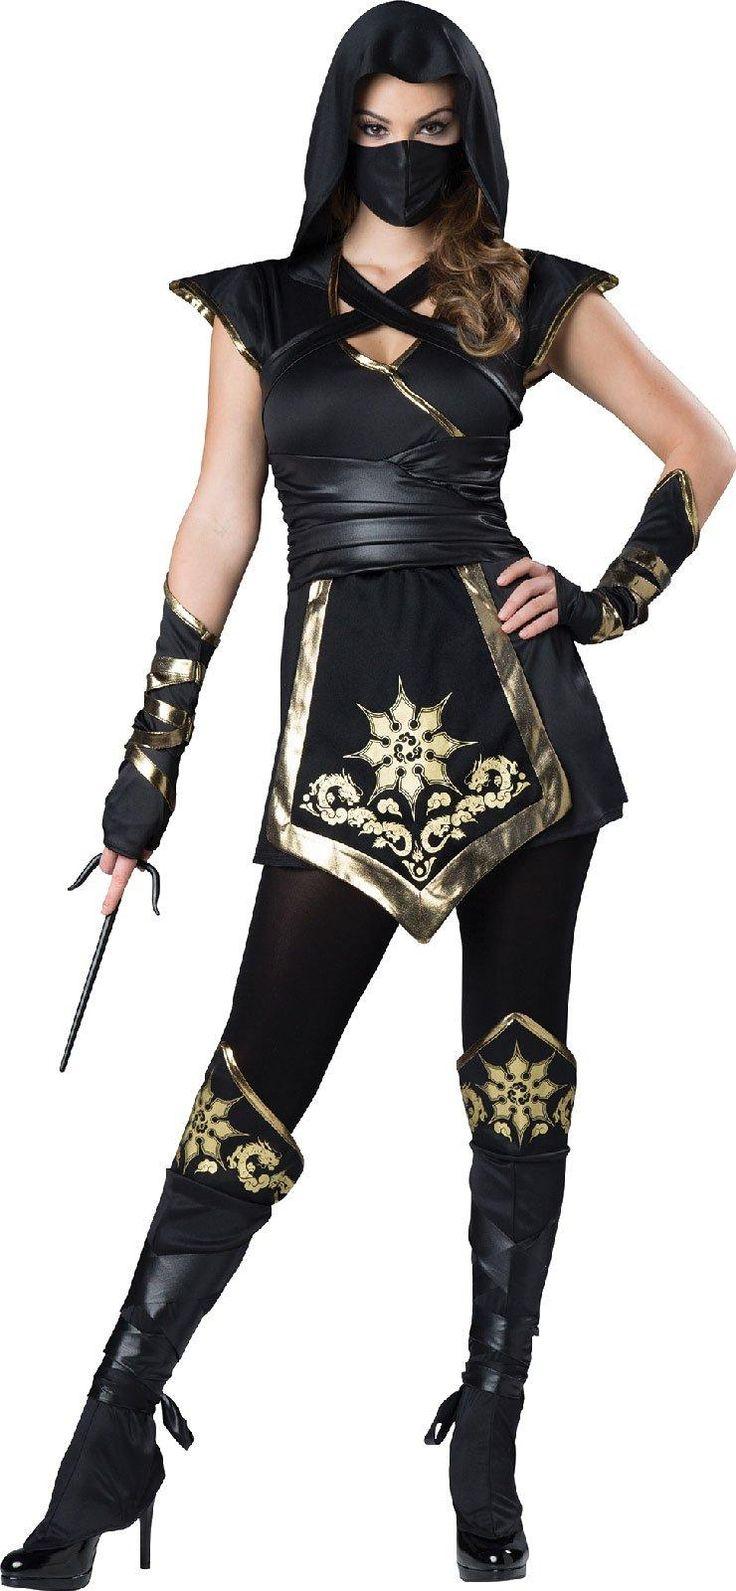 womens elite ninja costume - Judy Moody Halloween Costume